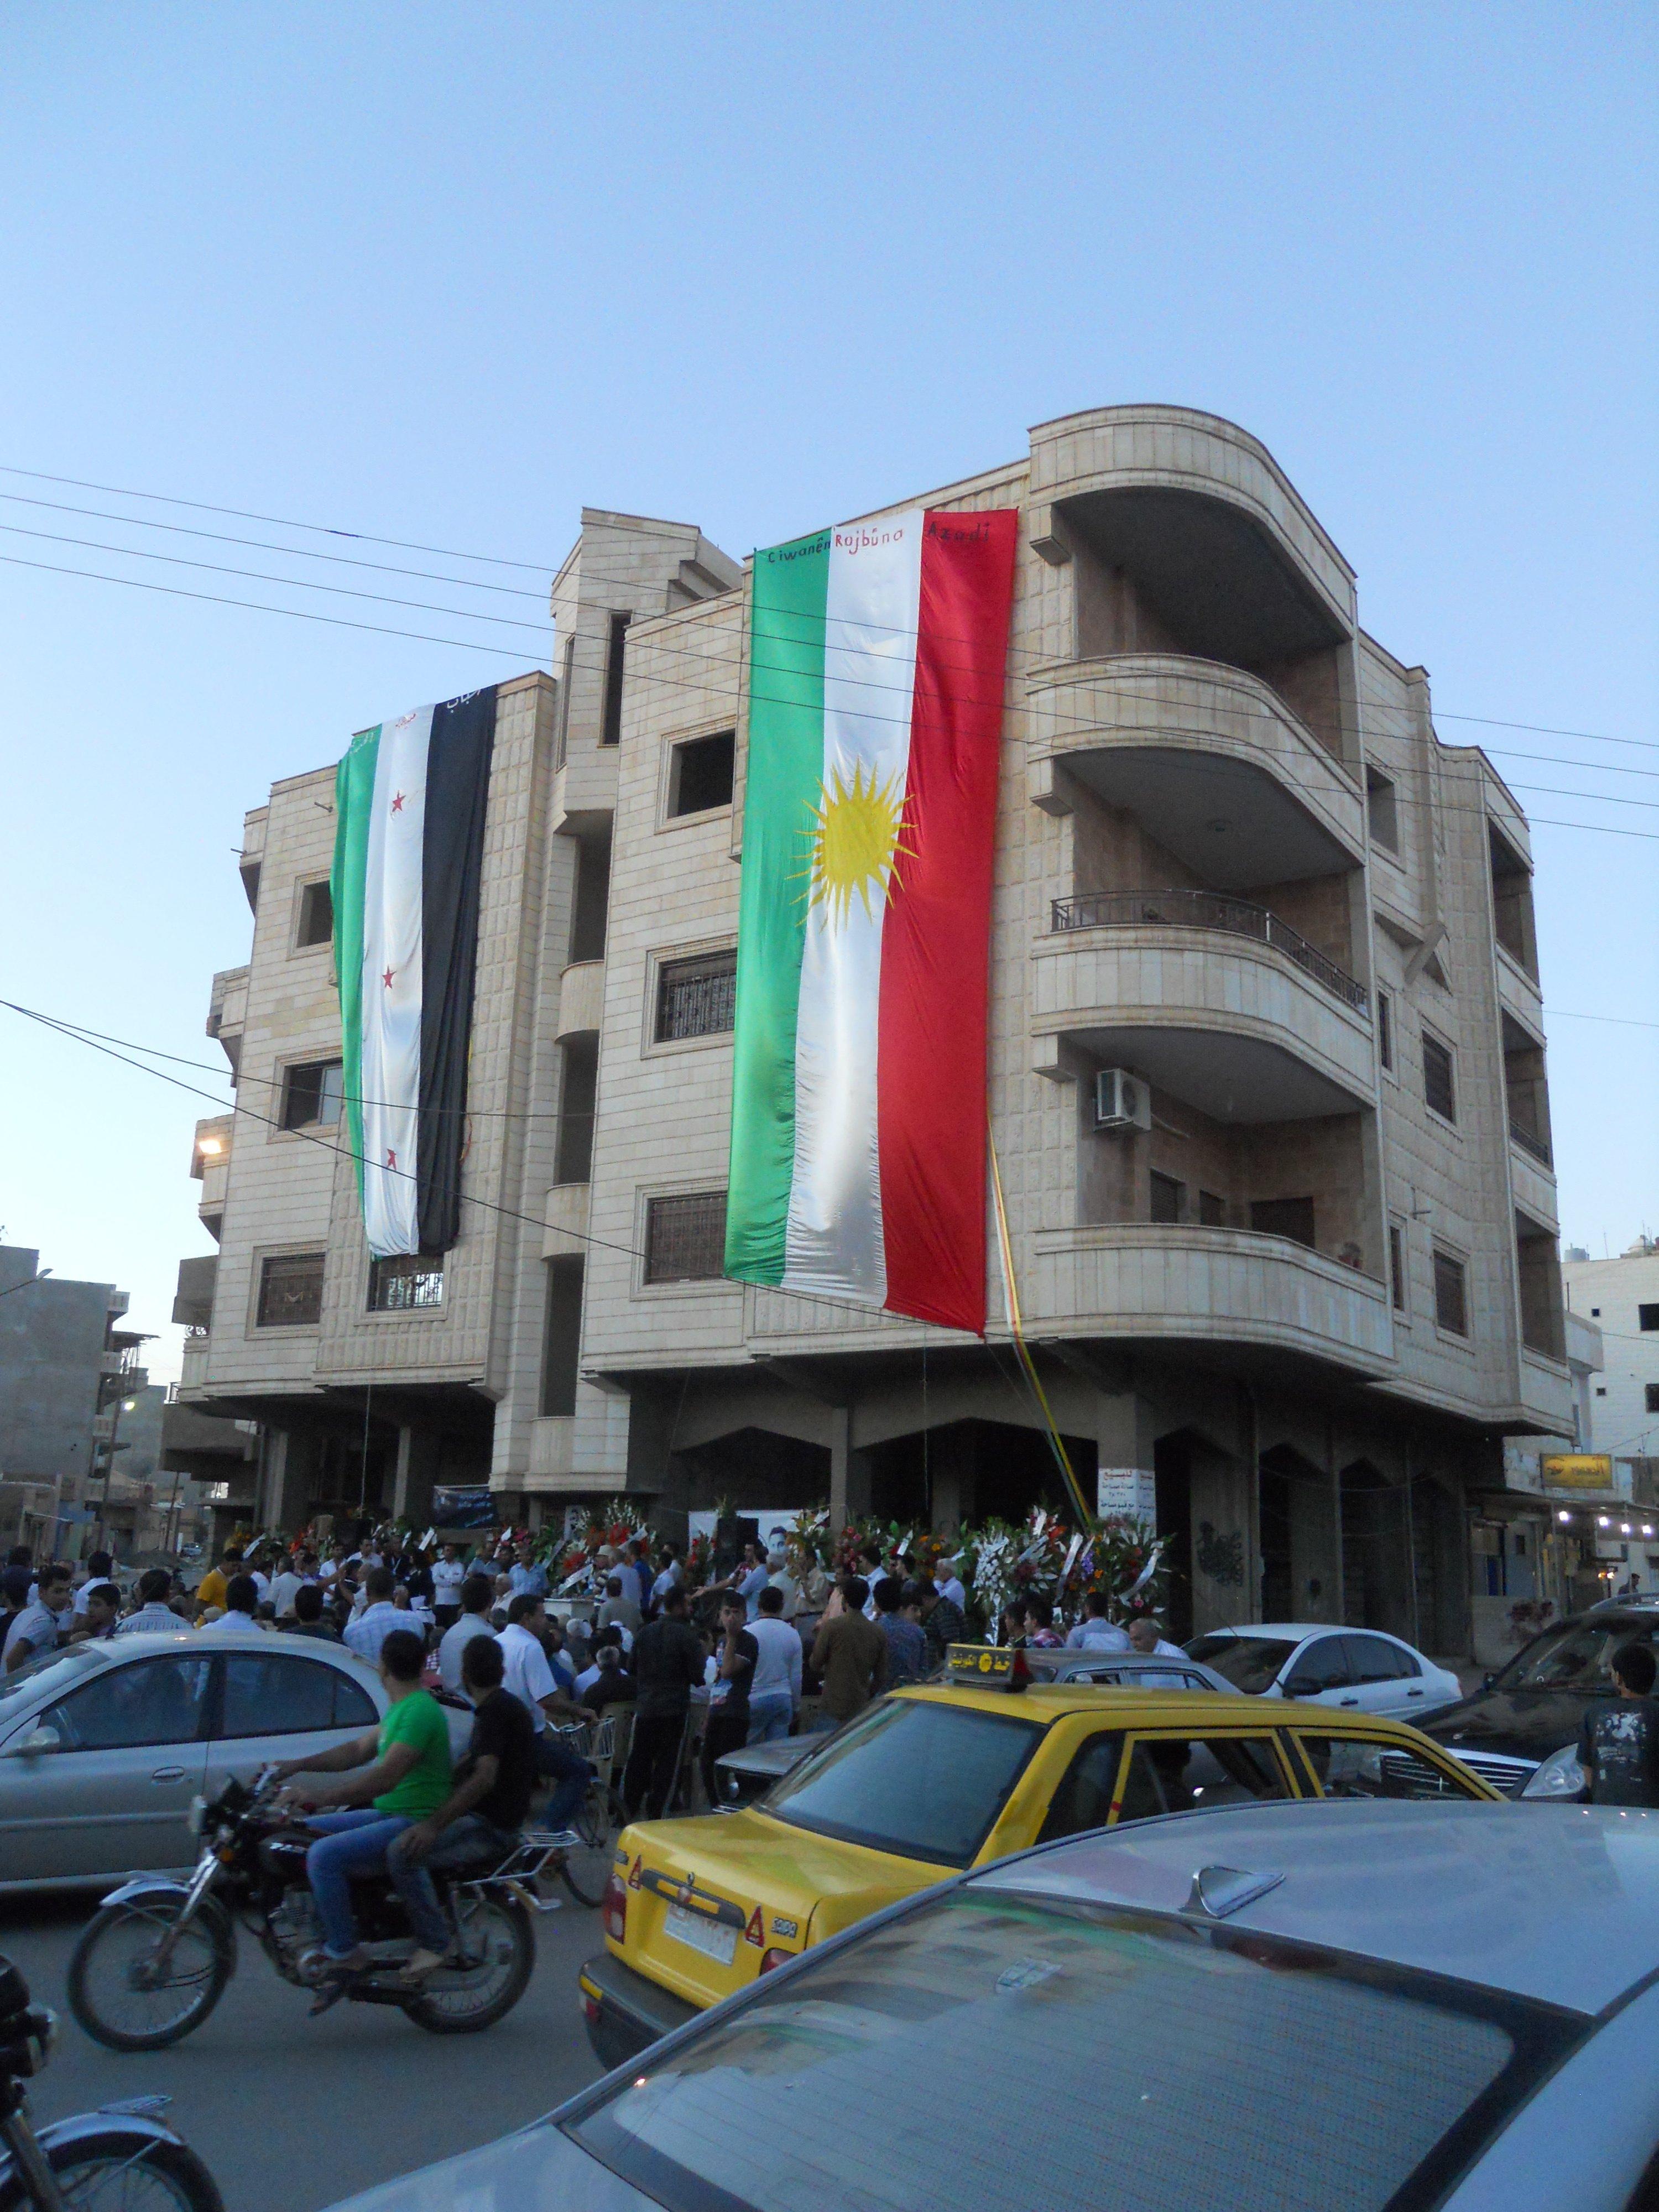 Explosion at Syrian Intelligence Center in Qamişlo